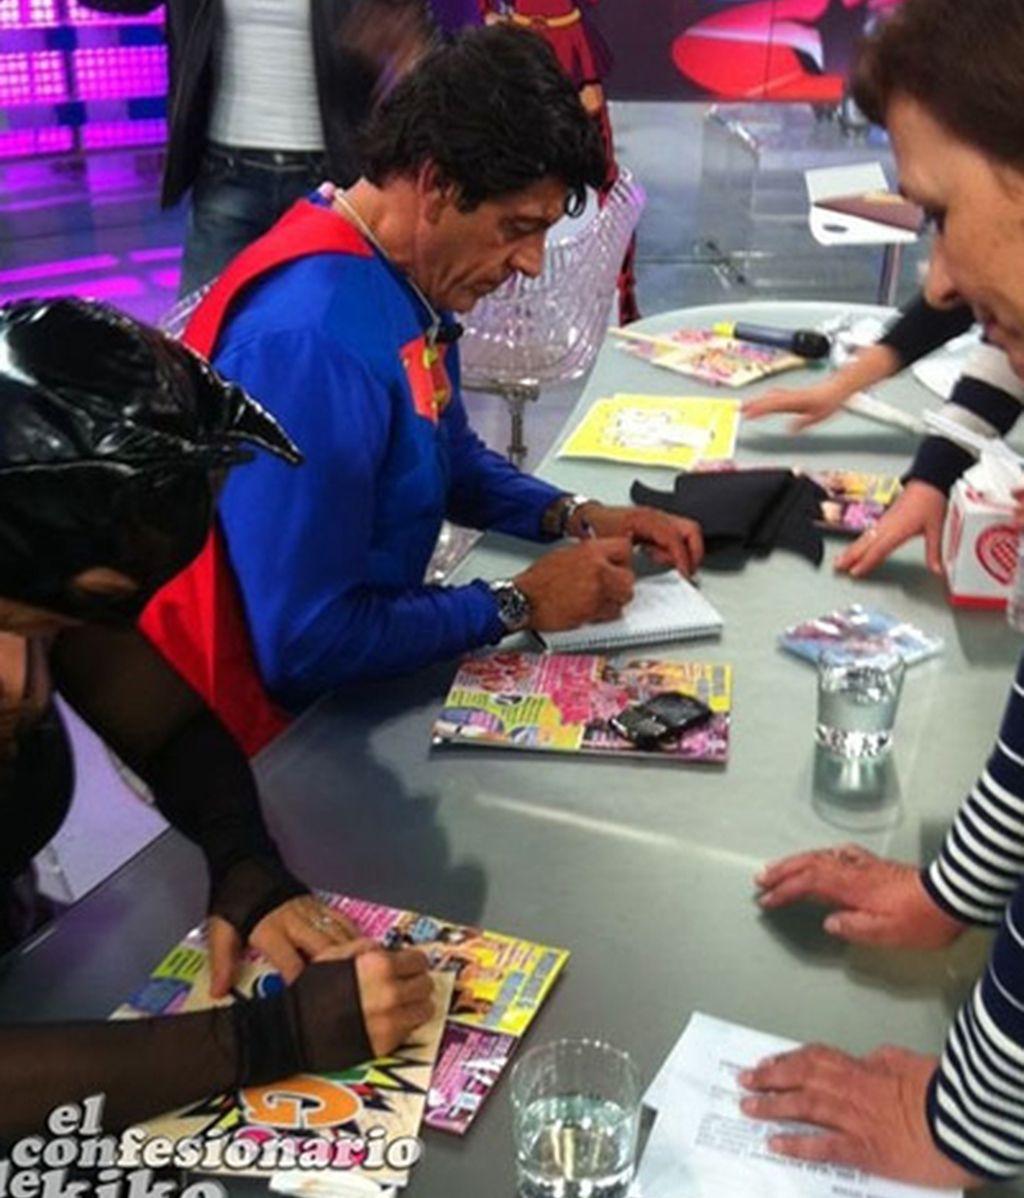 Los superhéroes, firmando autógrafos